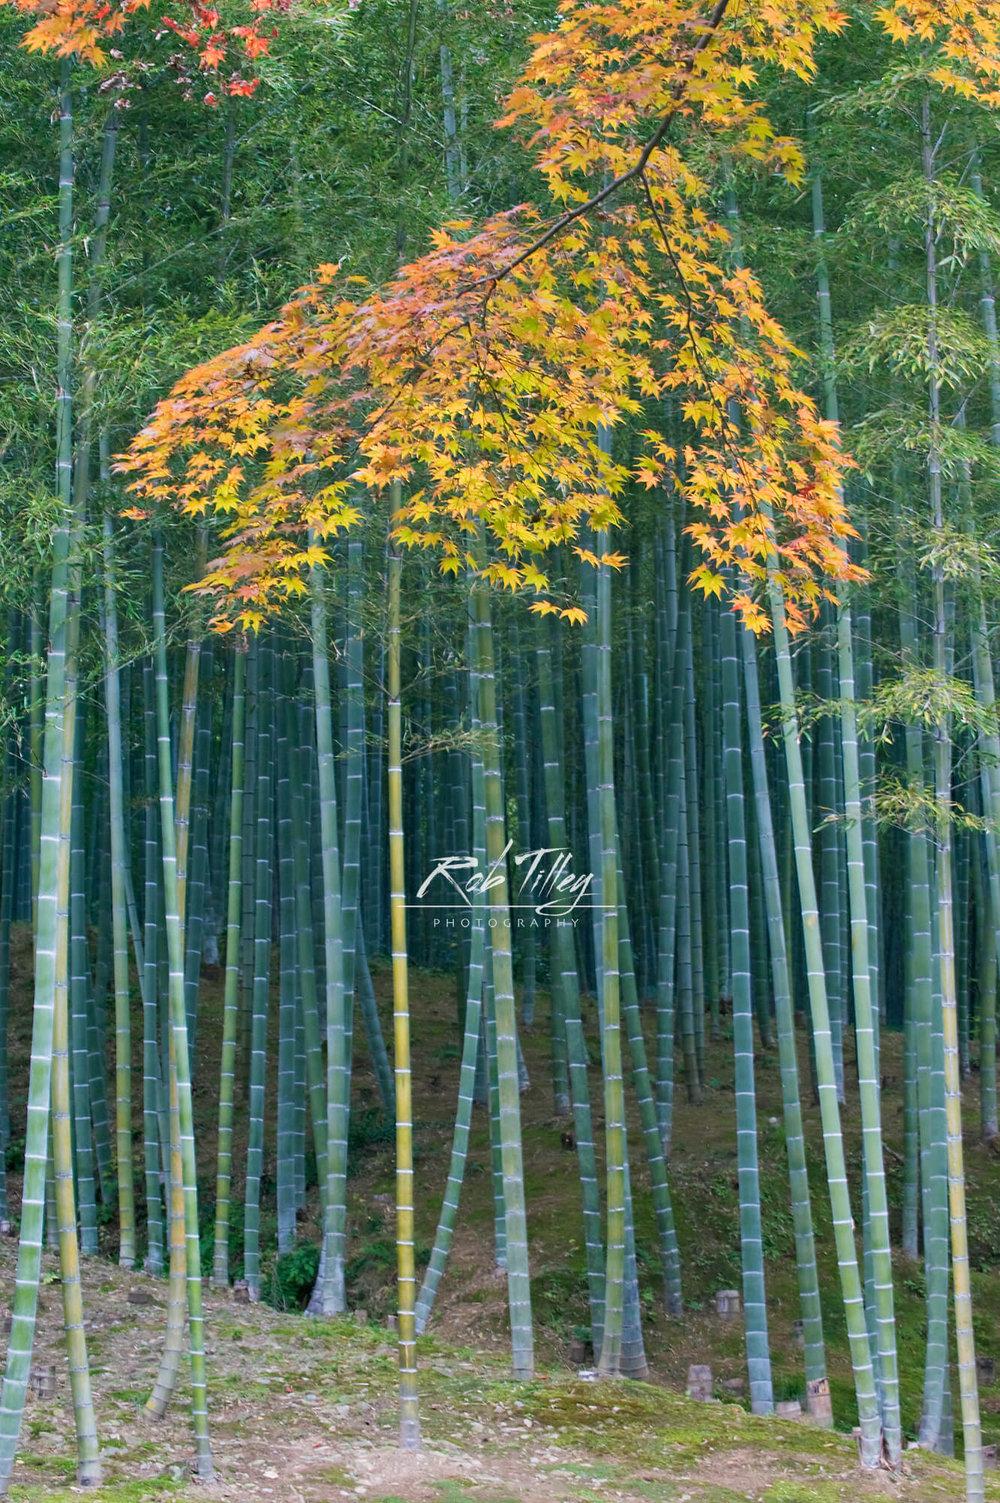 Autumn Bamboo Grove